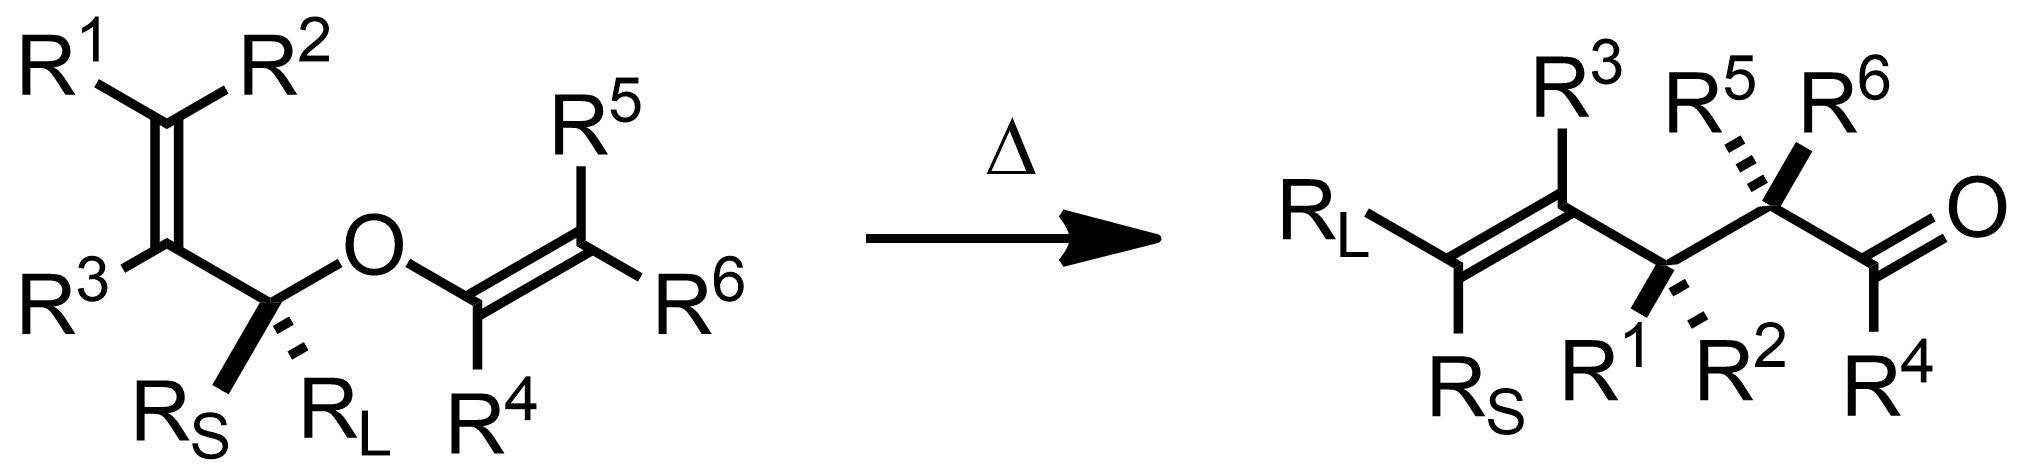 Schematic representation of the Claisen Rearrangement.